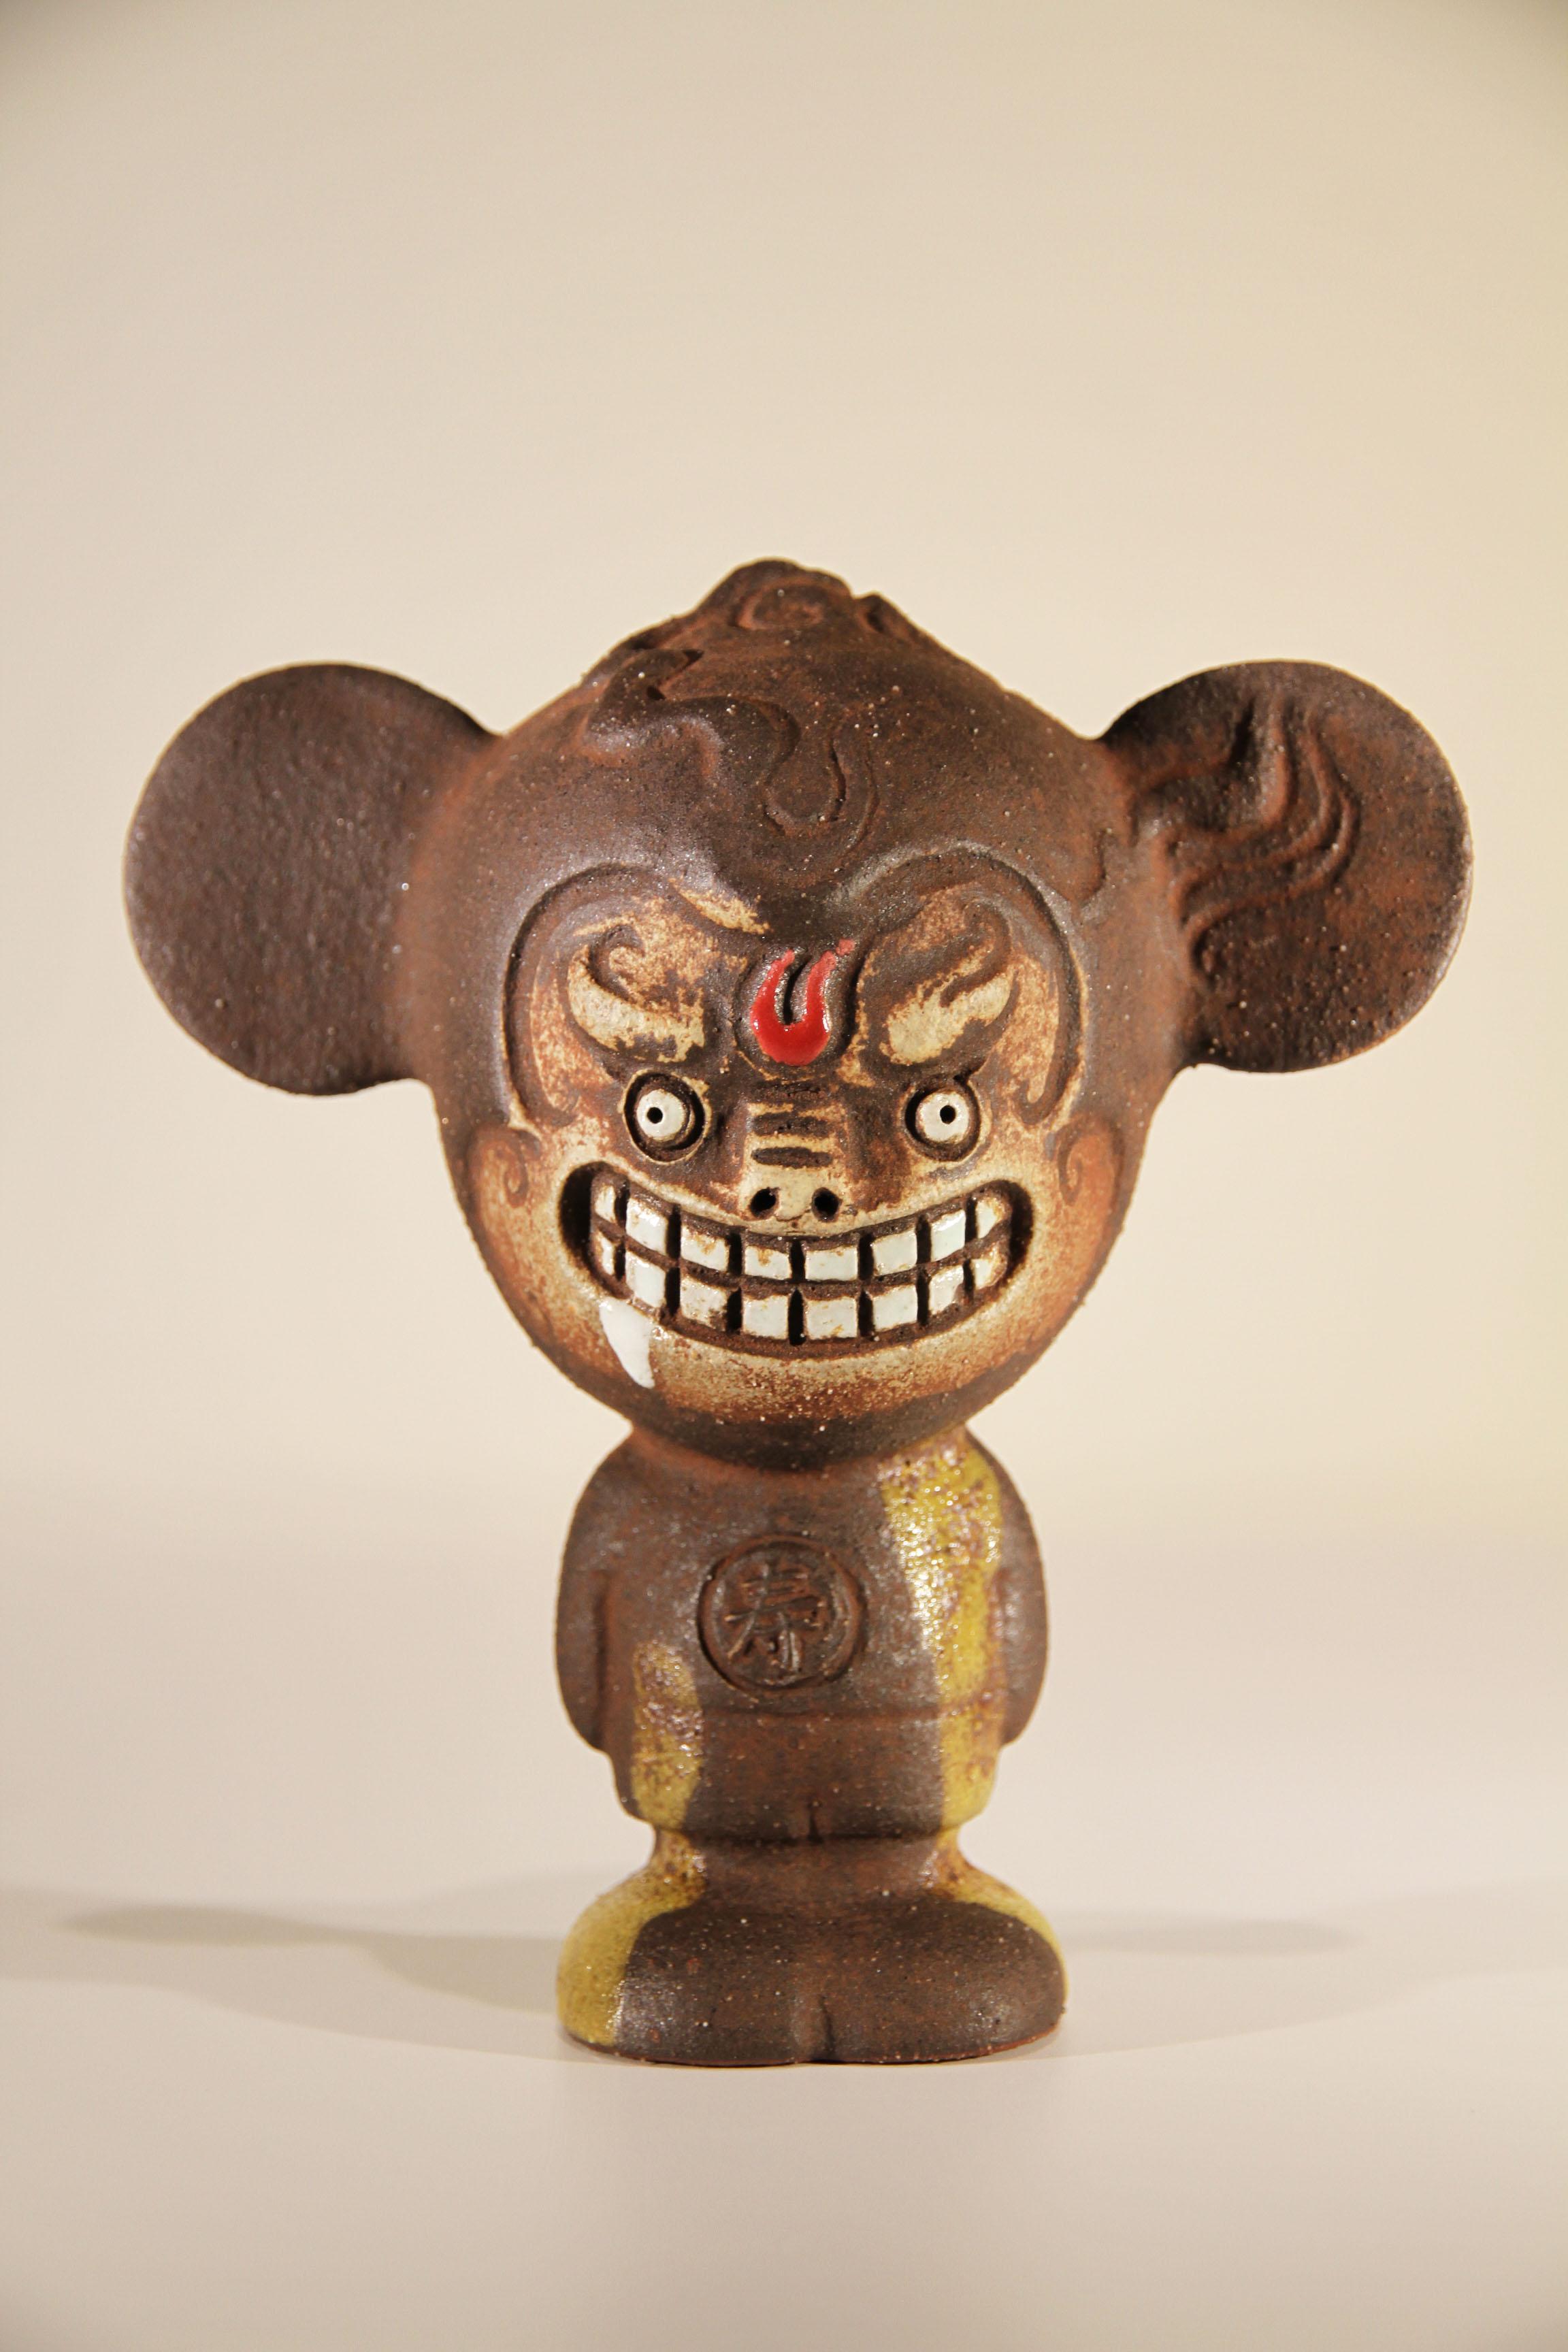 張山 CHANG Shan〈台灣囝仔(猴) Taiwanese Kids-Monkey〉